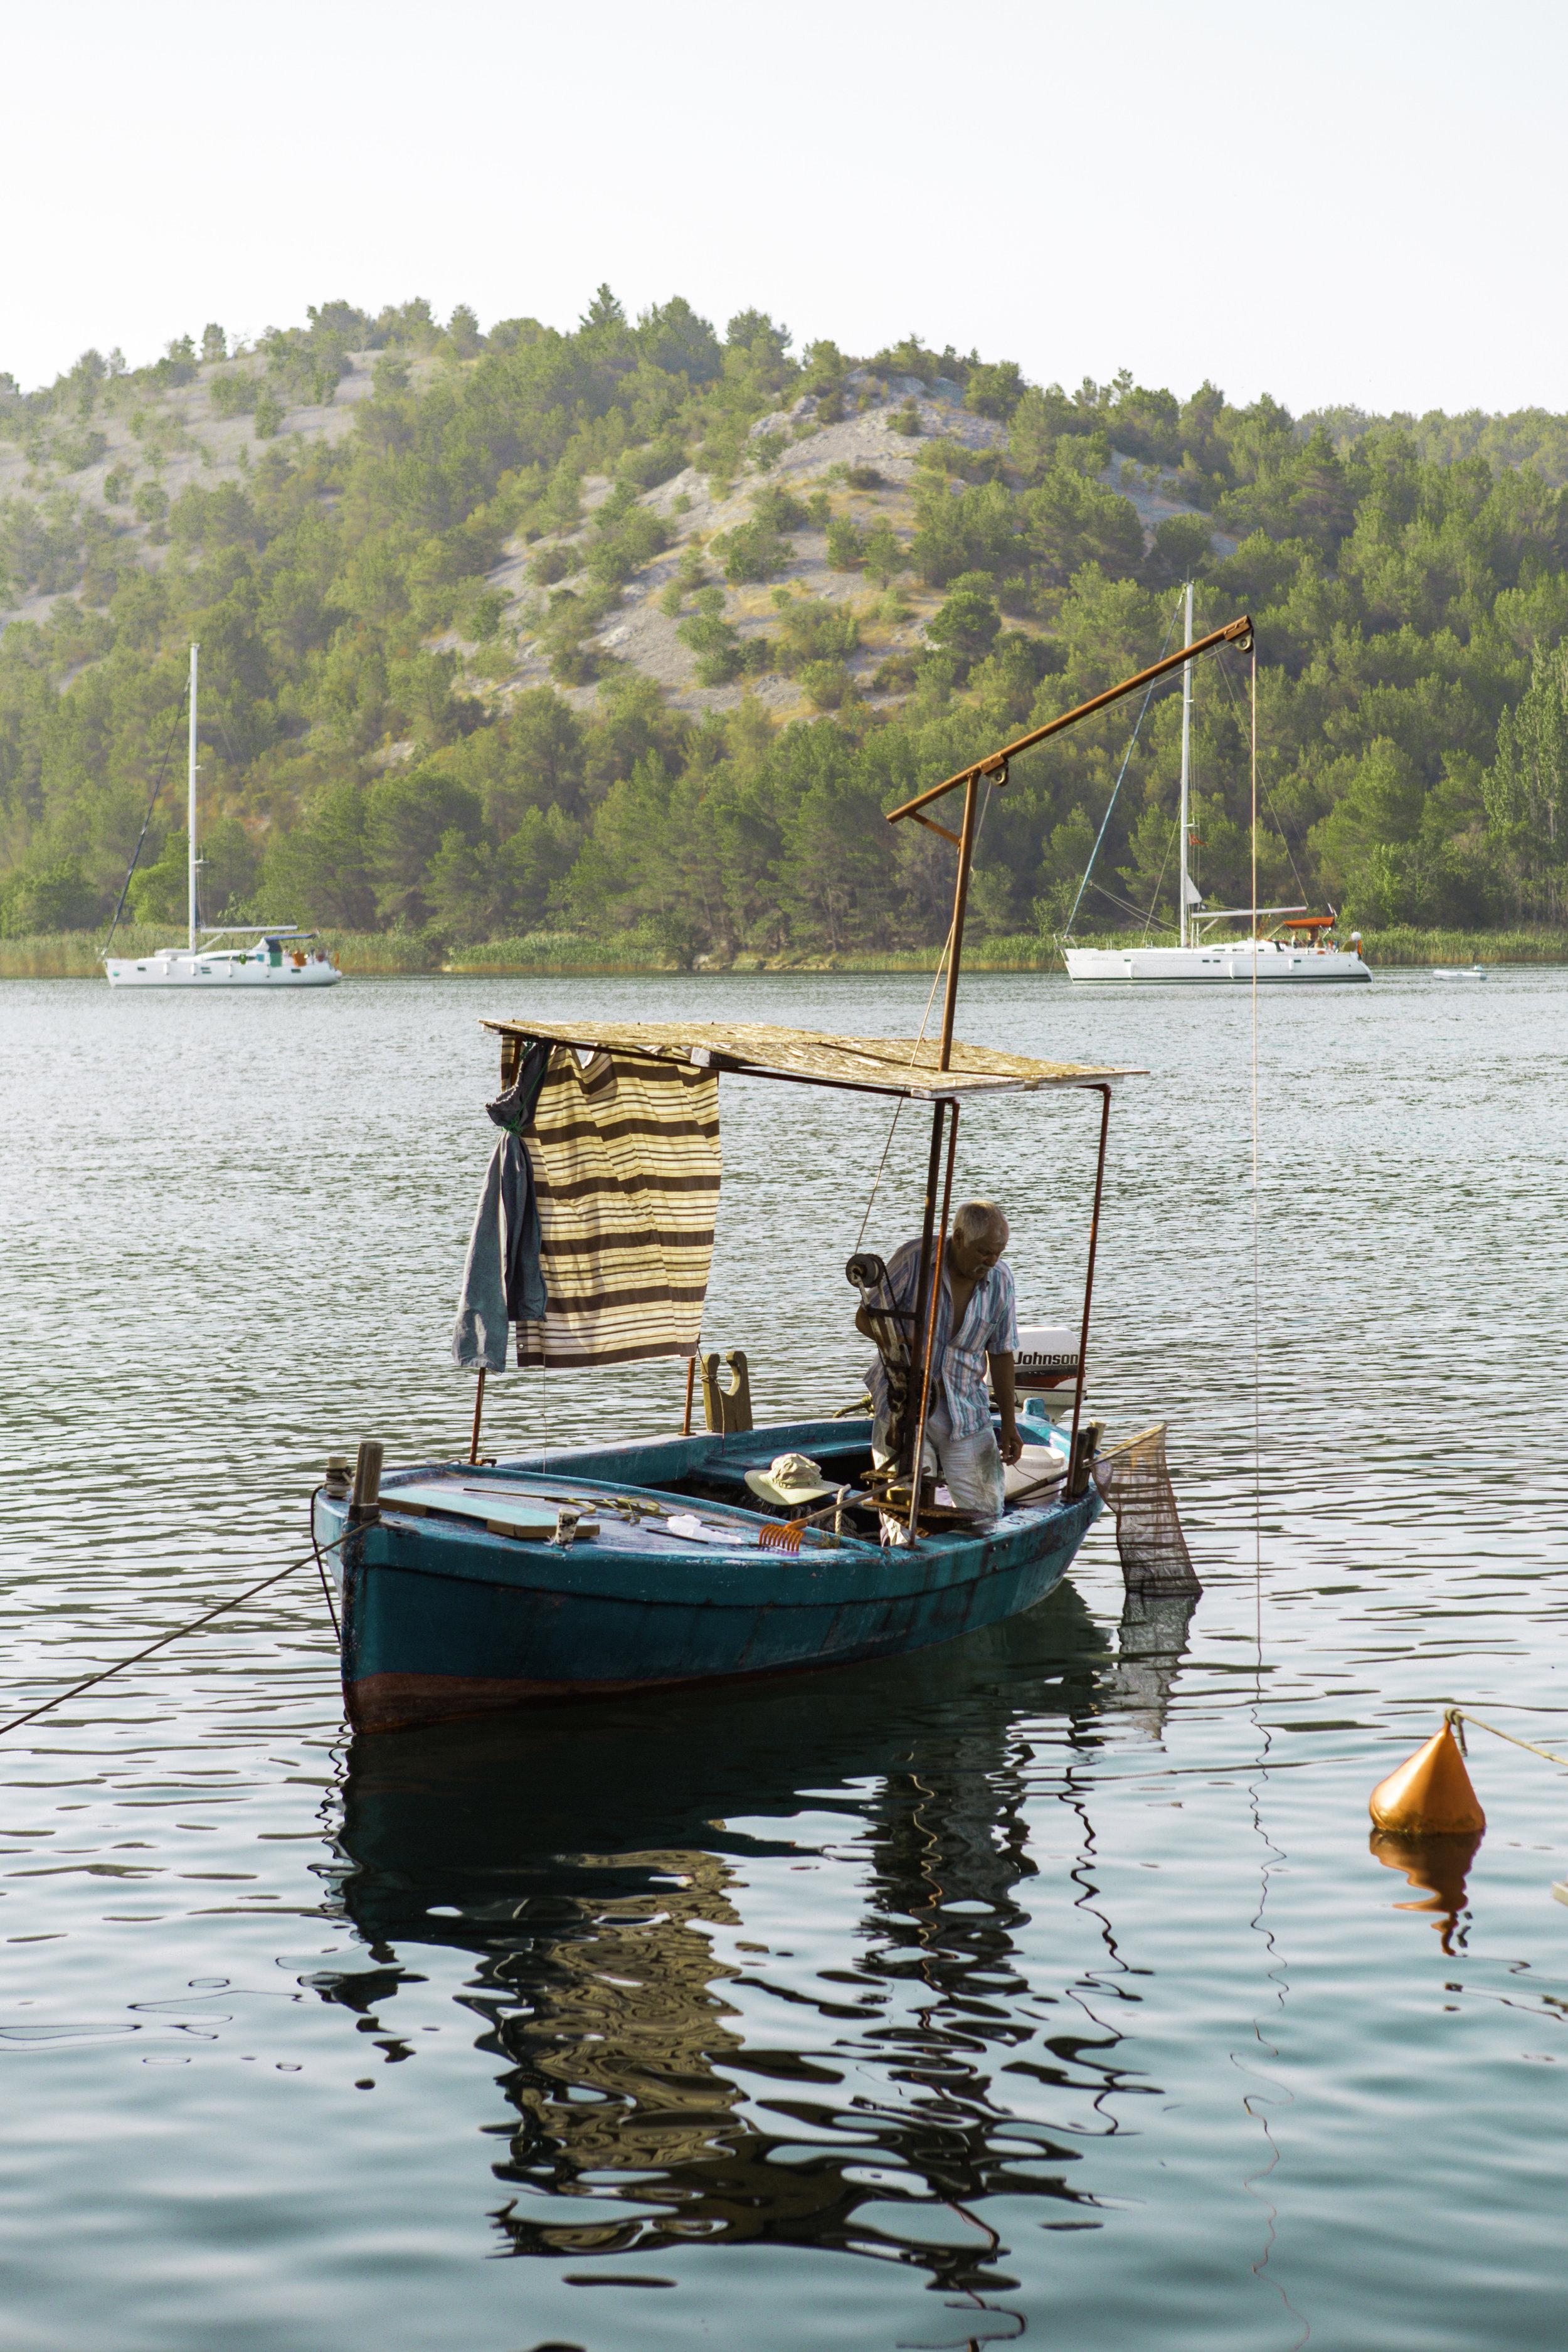 Fisherman at Skradin Port - Croatia - illumelation.jpg